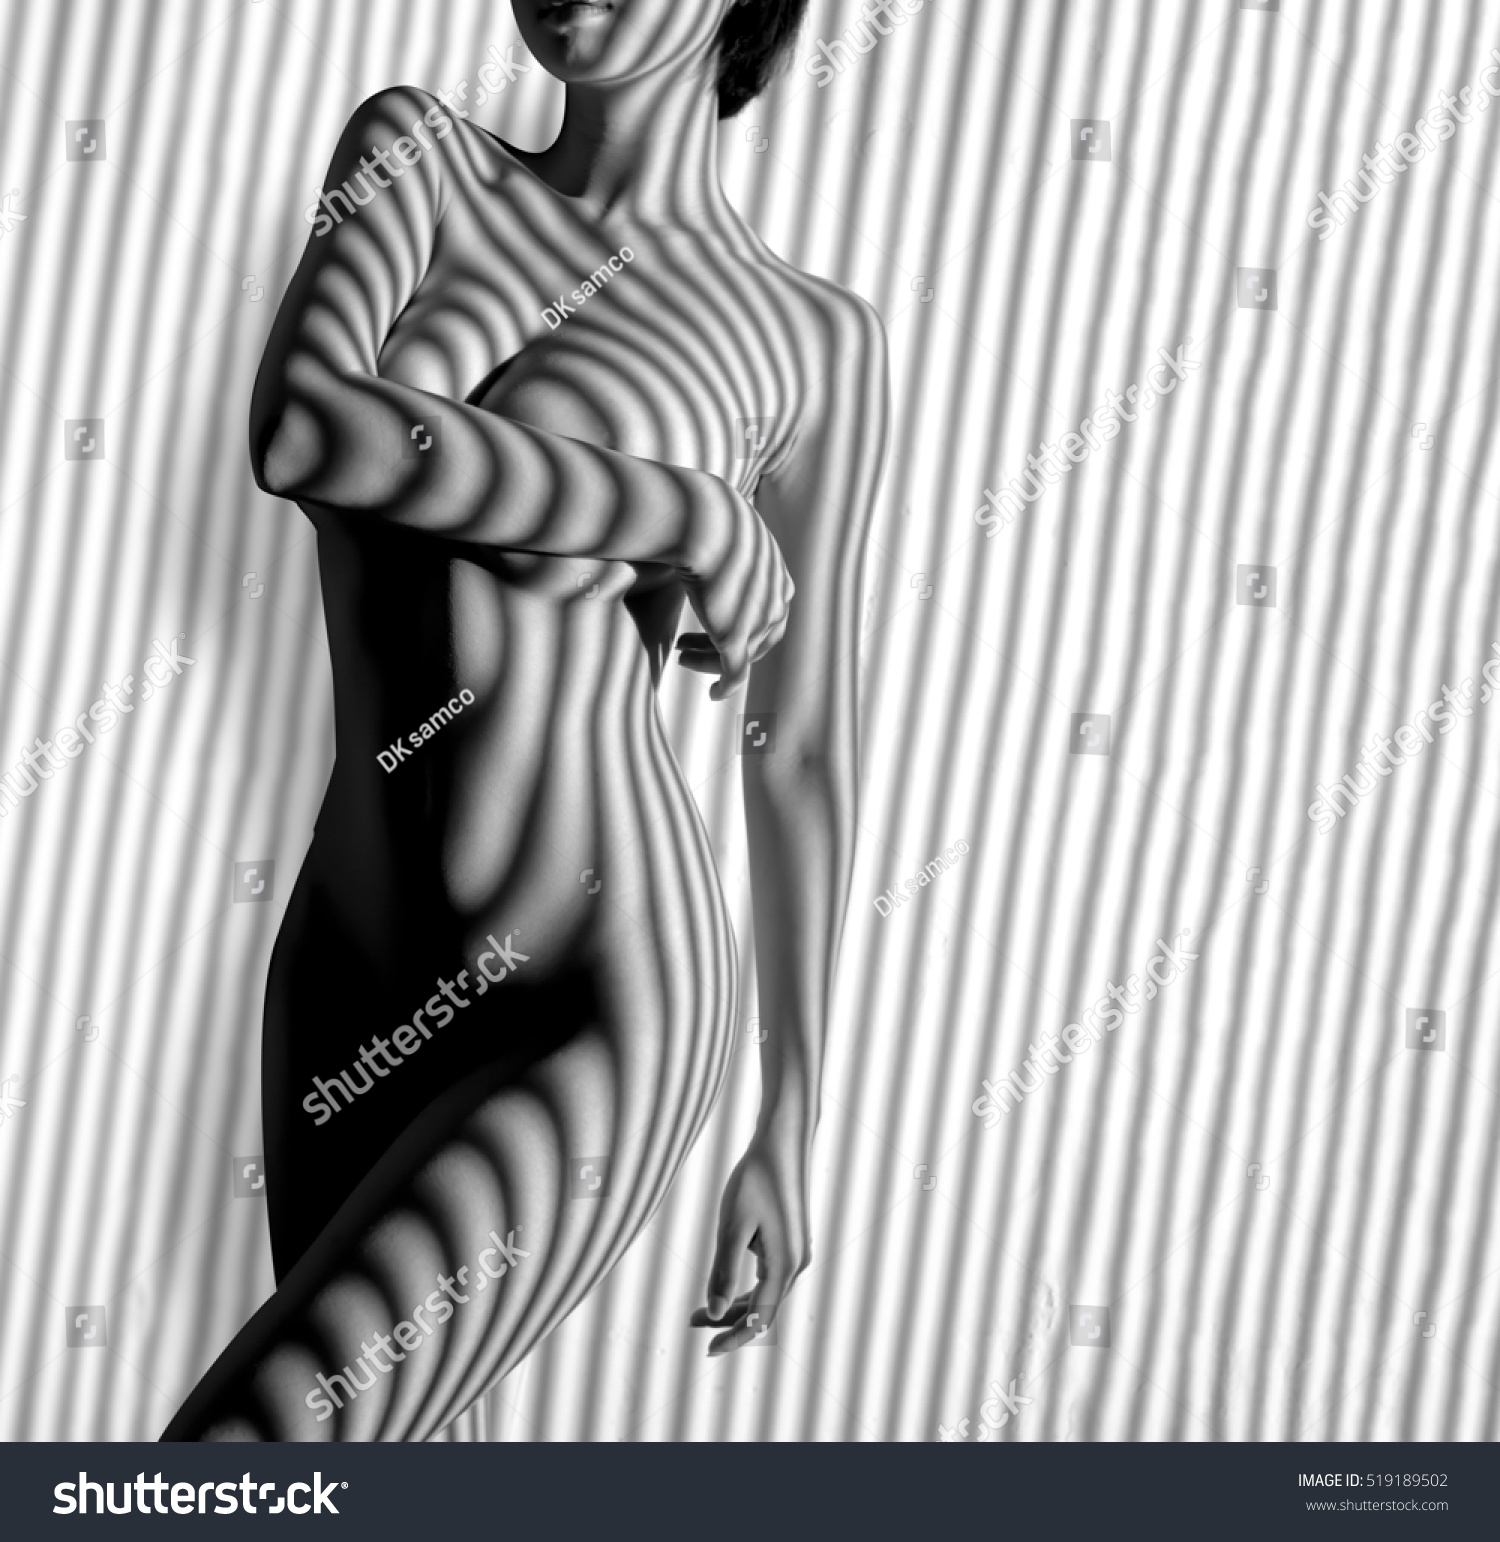 Nude female bodybuilders in black and white